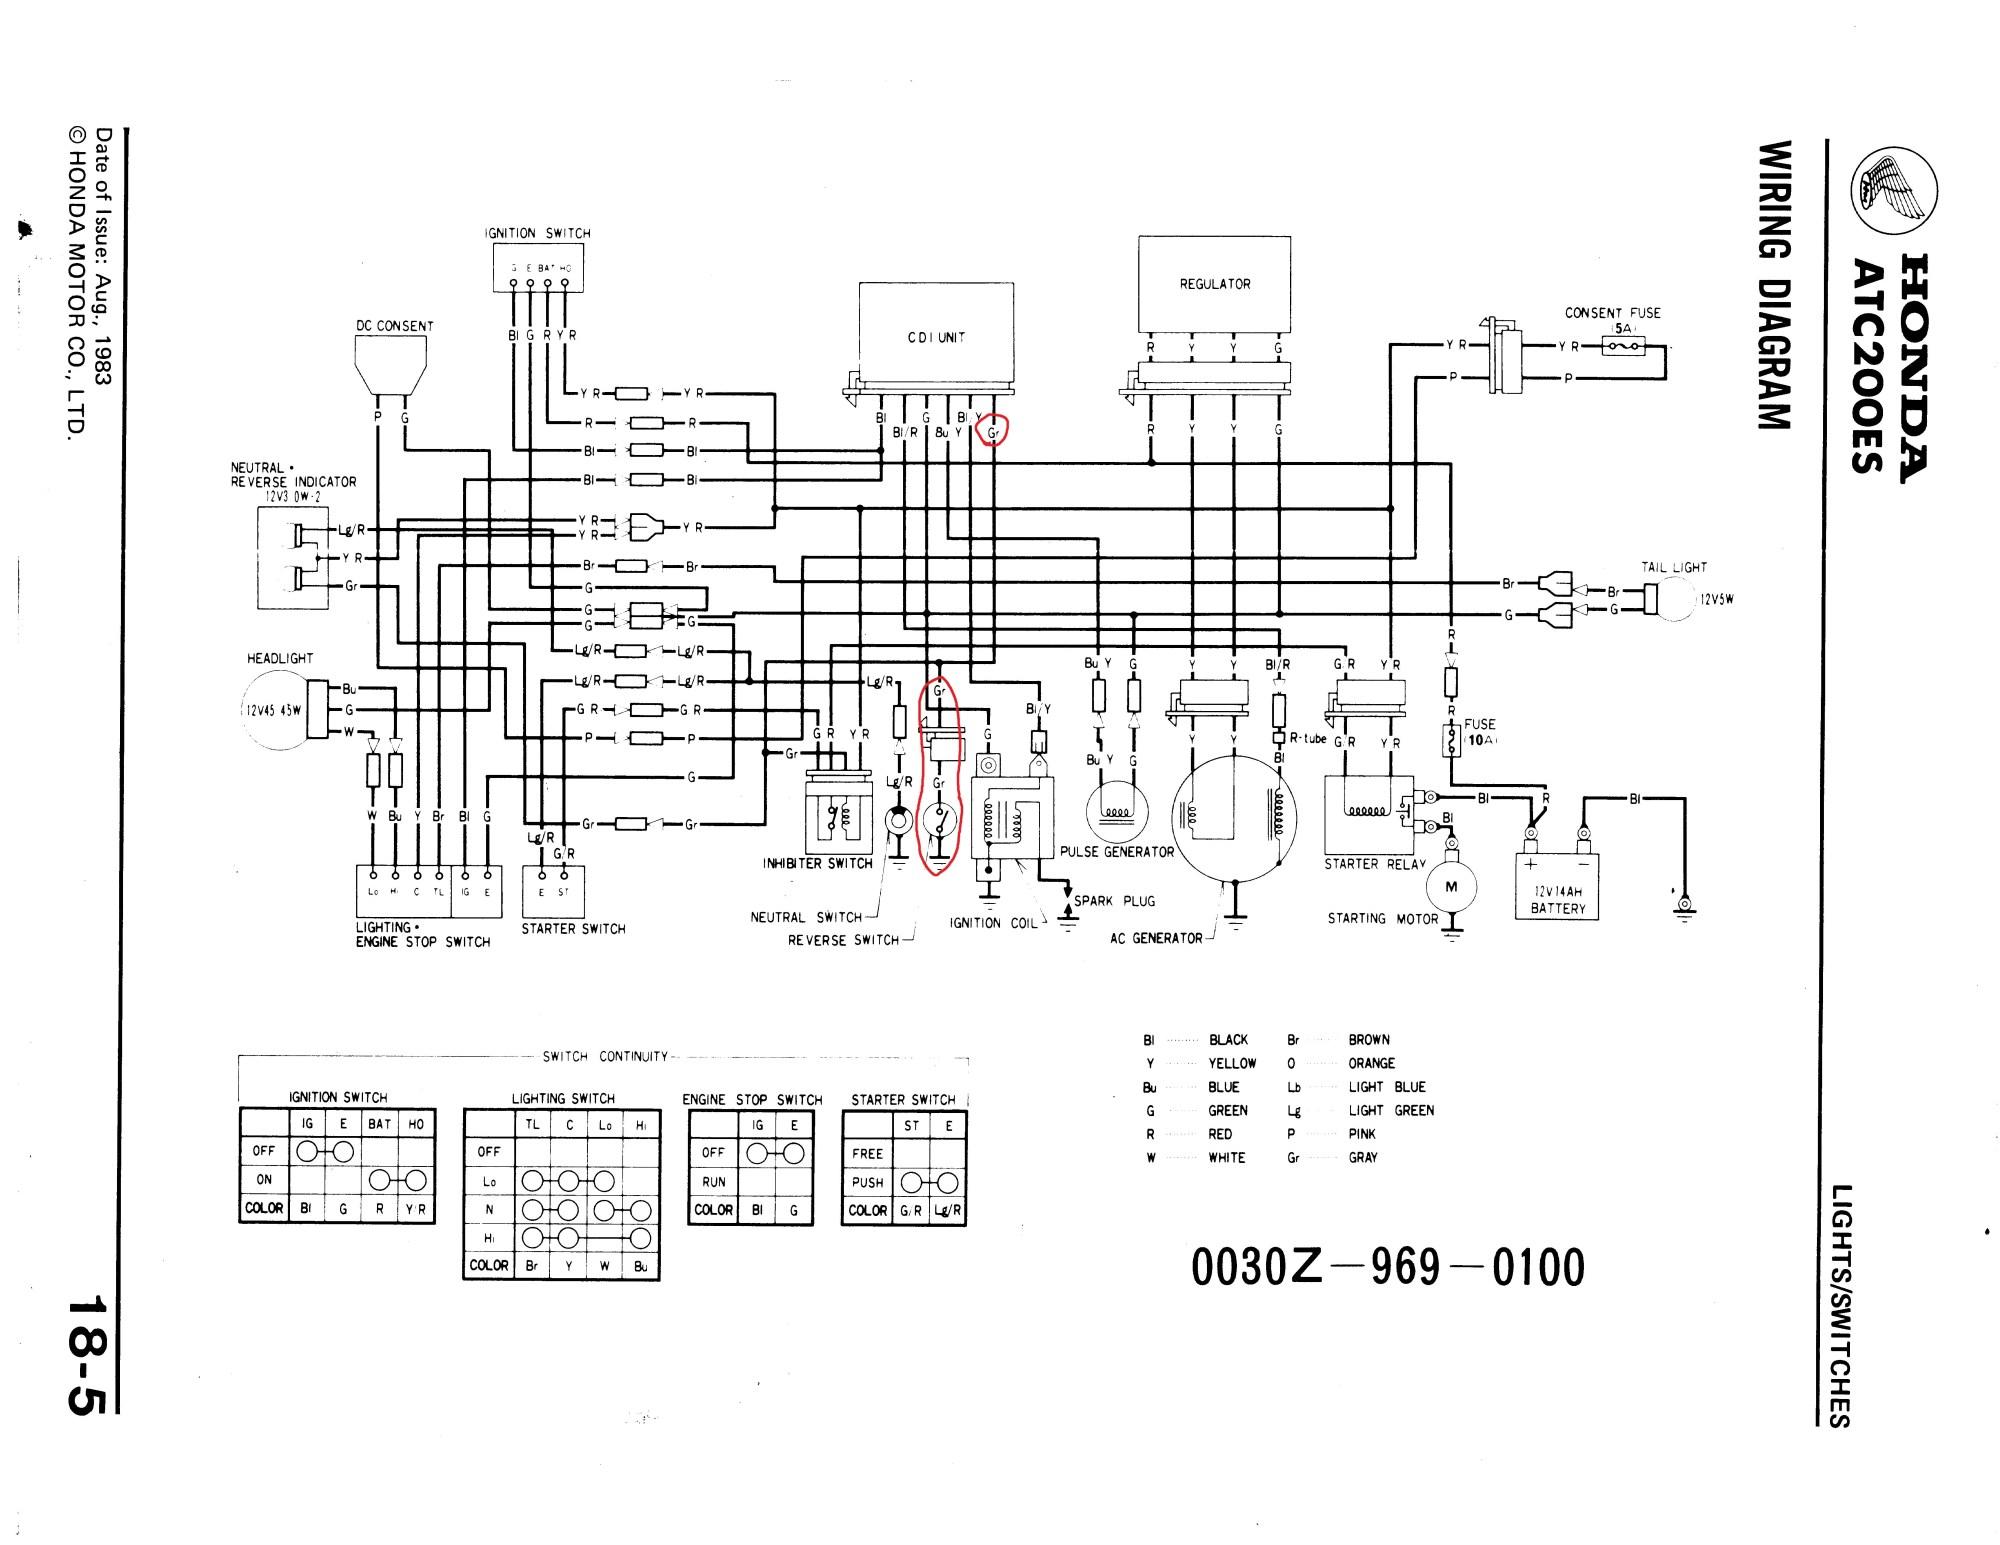 hight resolution of honda small engine diagram 1996 honda 300 trx wiring diagram honda wiring diagrams instructions of honda